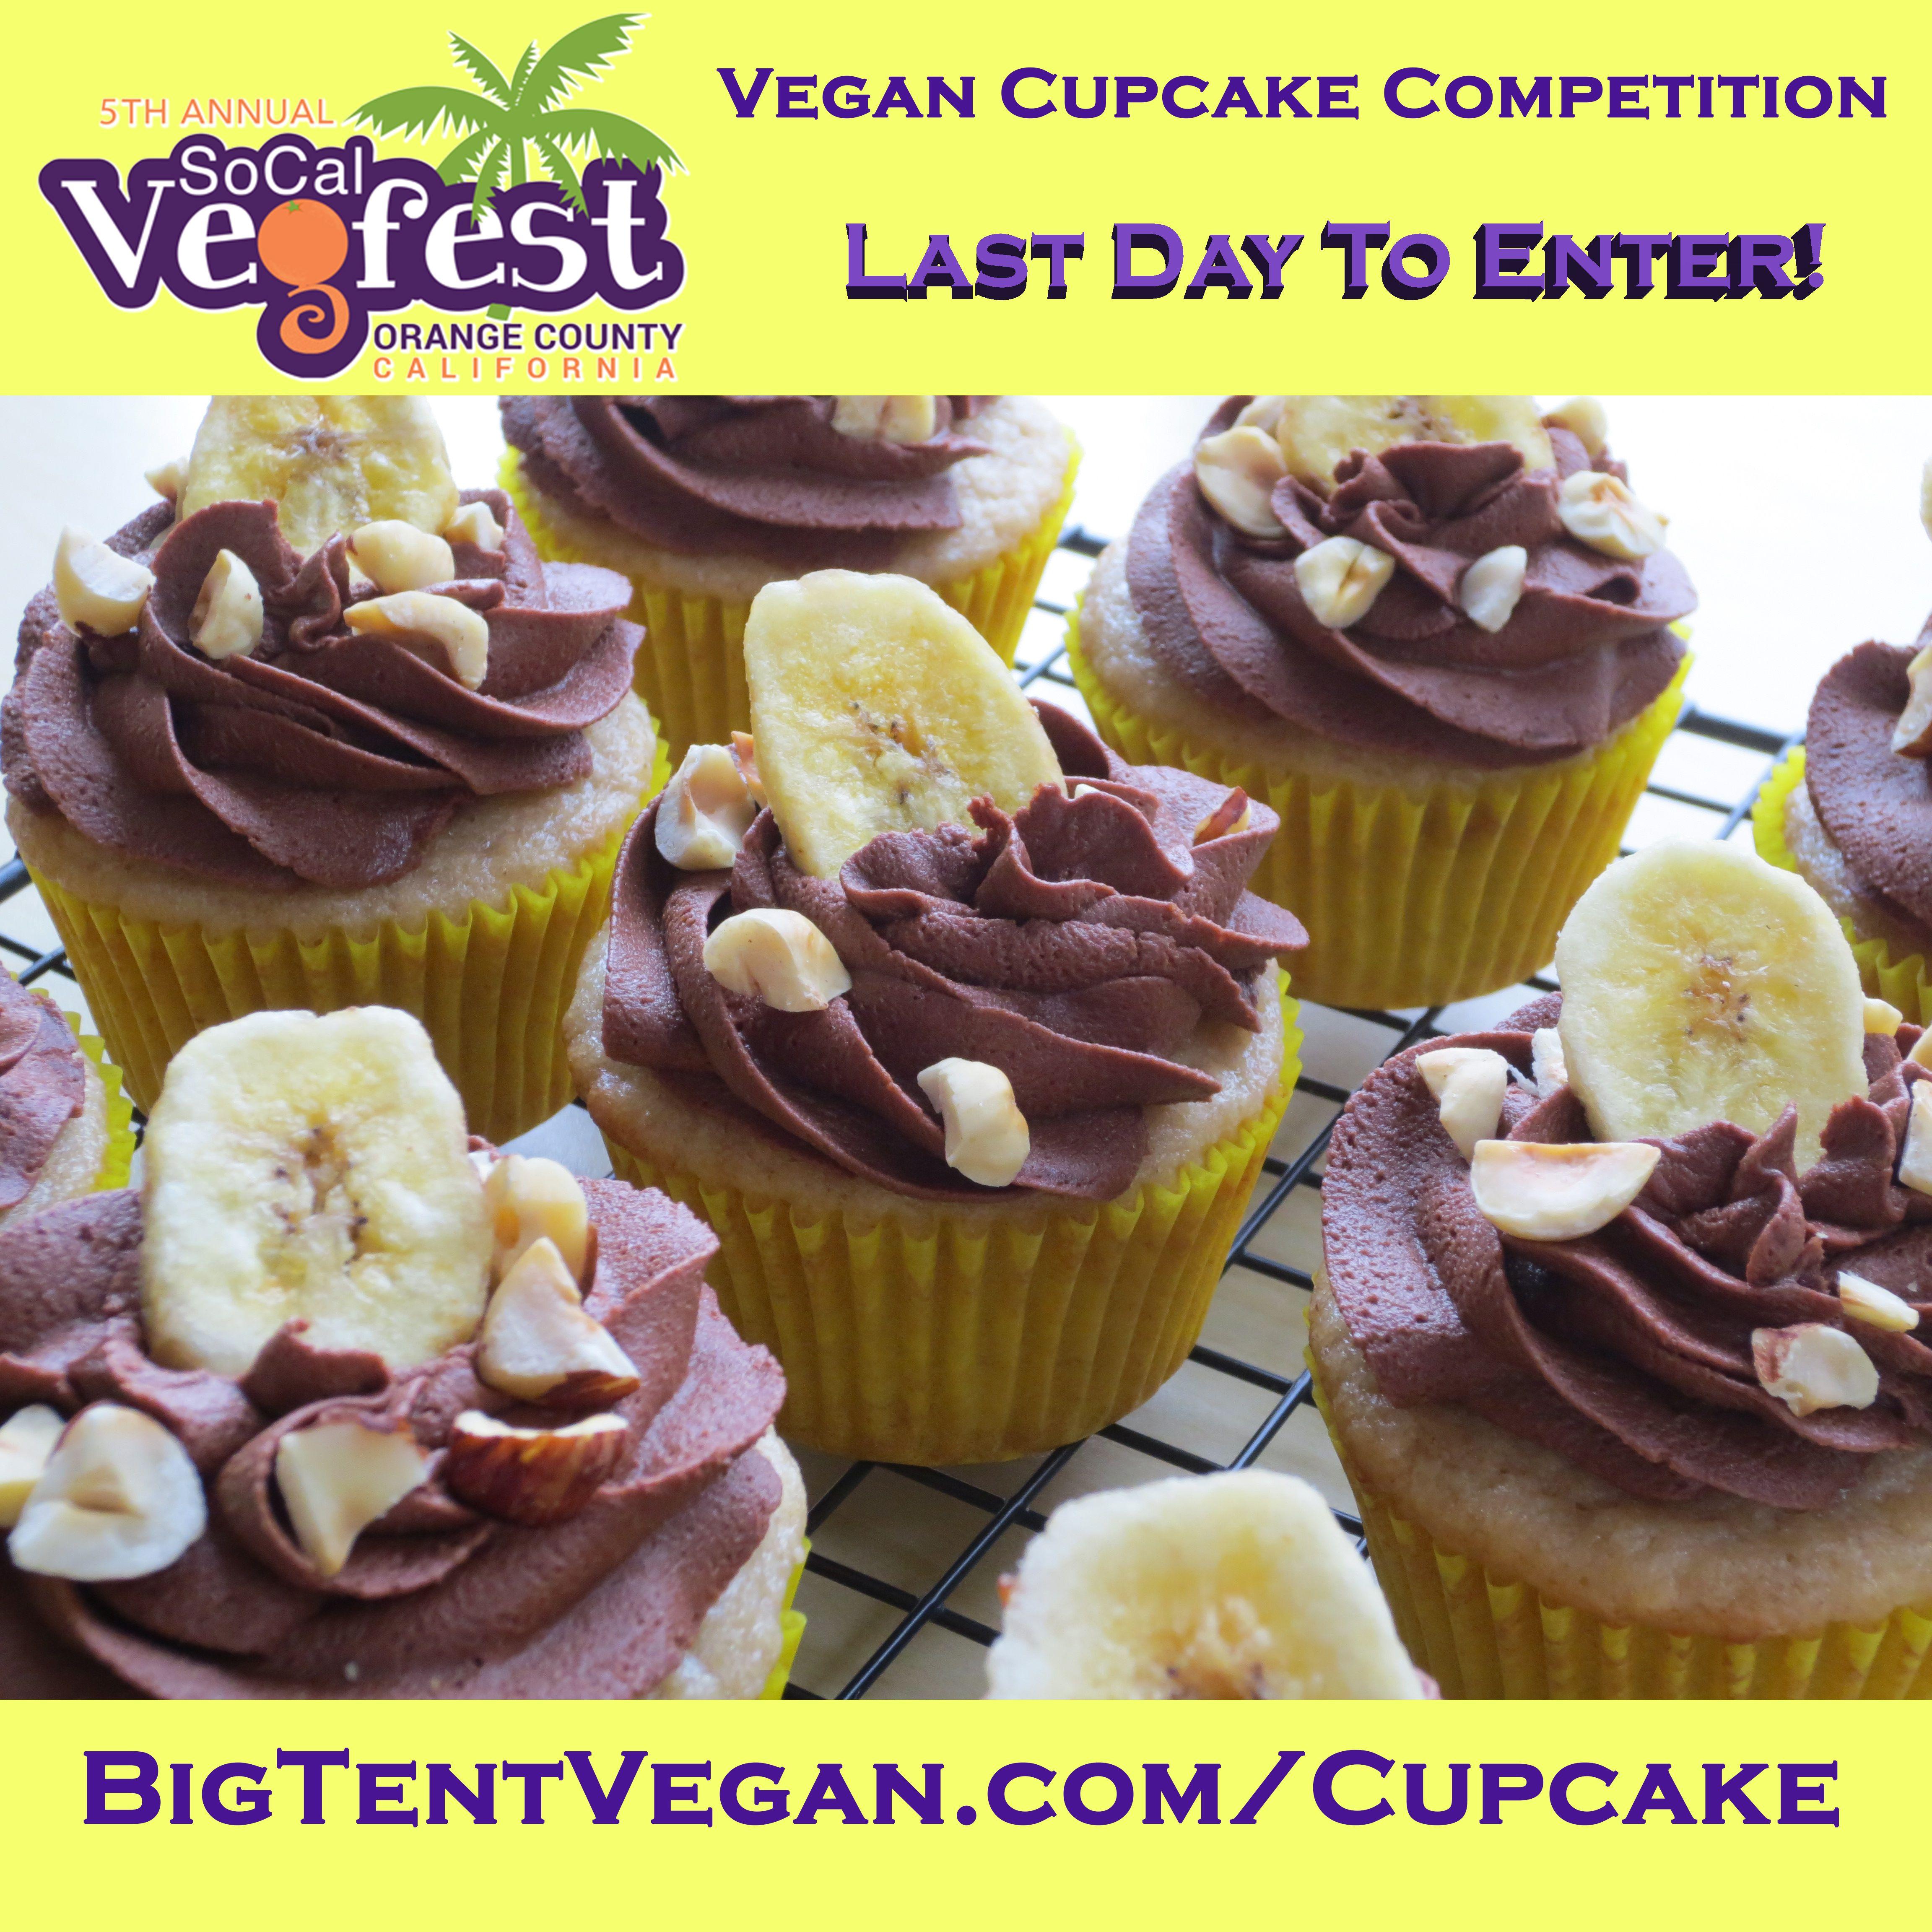 2019 Socal Vegfest Vegan Cupcake Competition Costa Mesa Ca Usa Vegan Cupcakes Cupcake Delivery Food